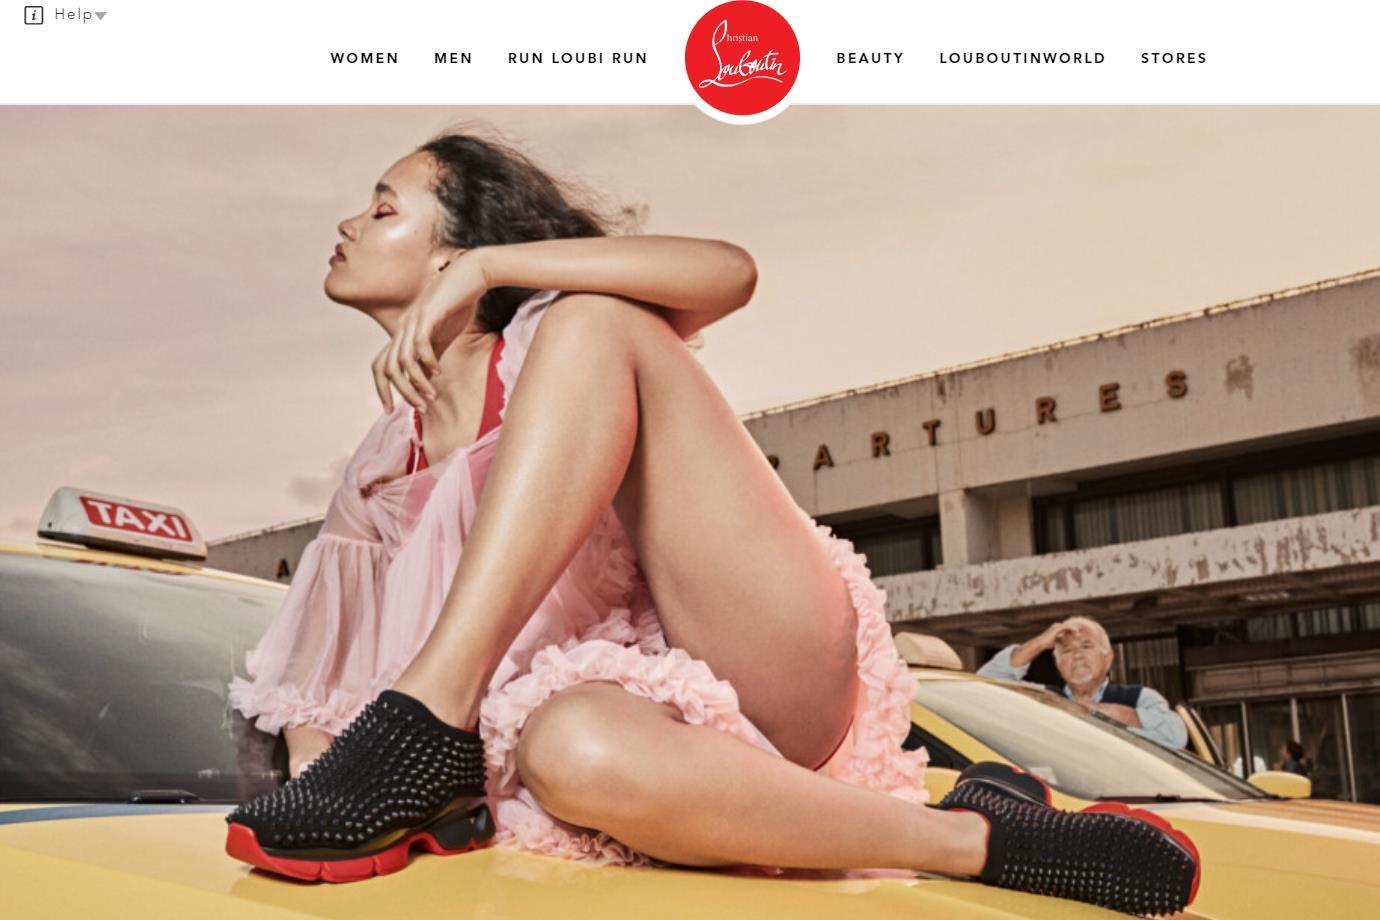 Christian Louboutin 发布与美国 R&B 歌手 Quincy Brown 合作的新款运动鞋短片